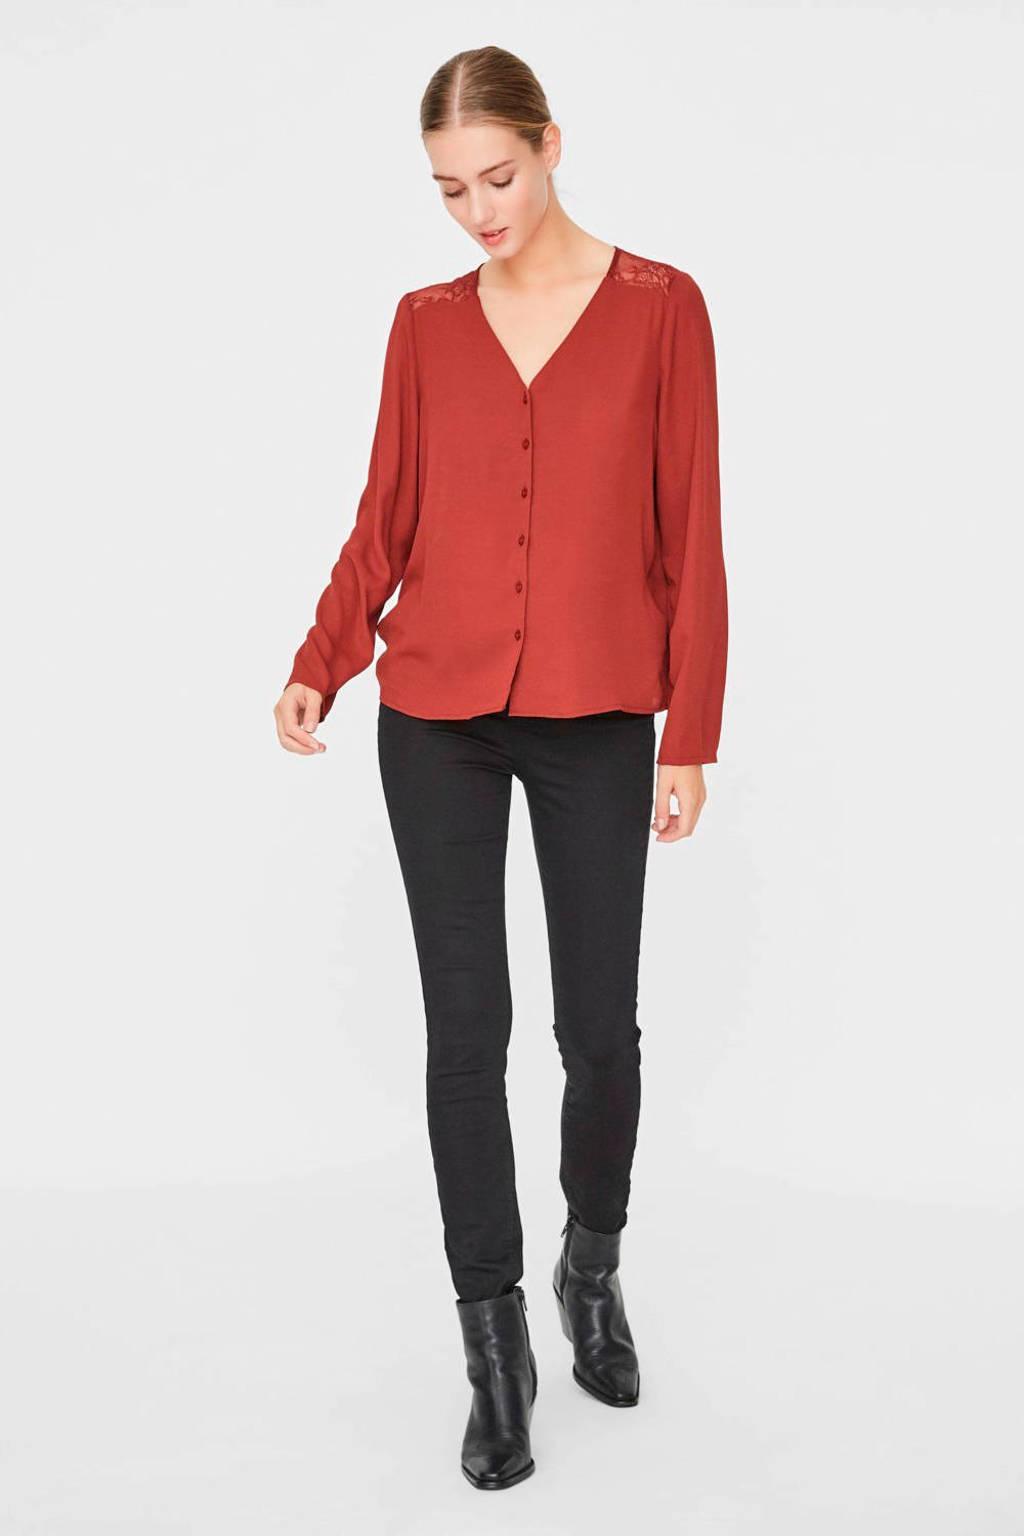 VERO MODA blouse met kant roodbruin, Roodbruin